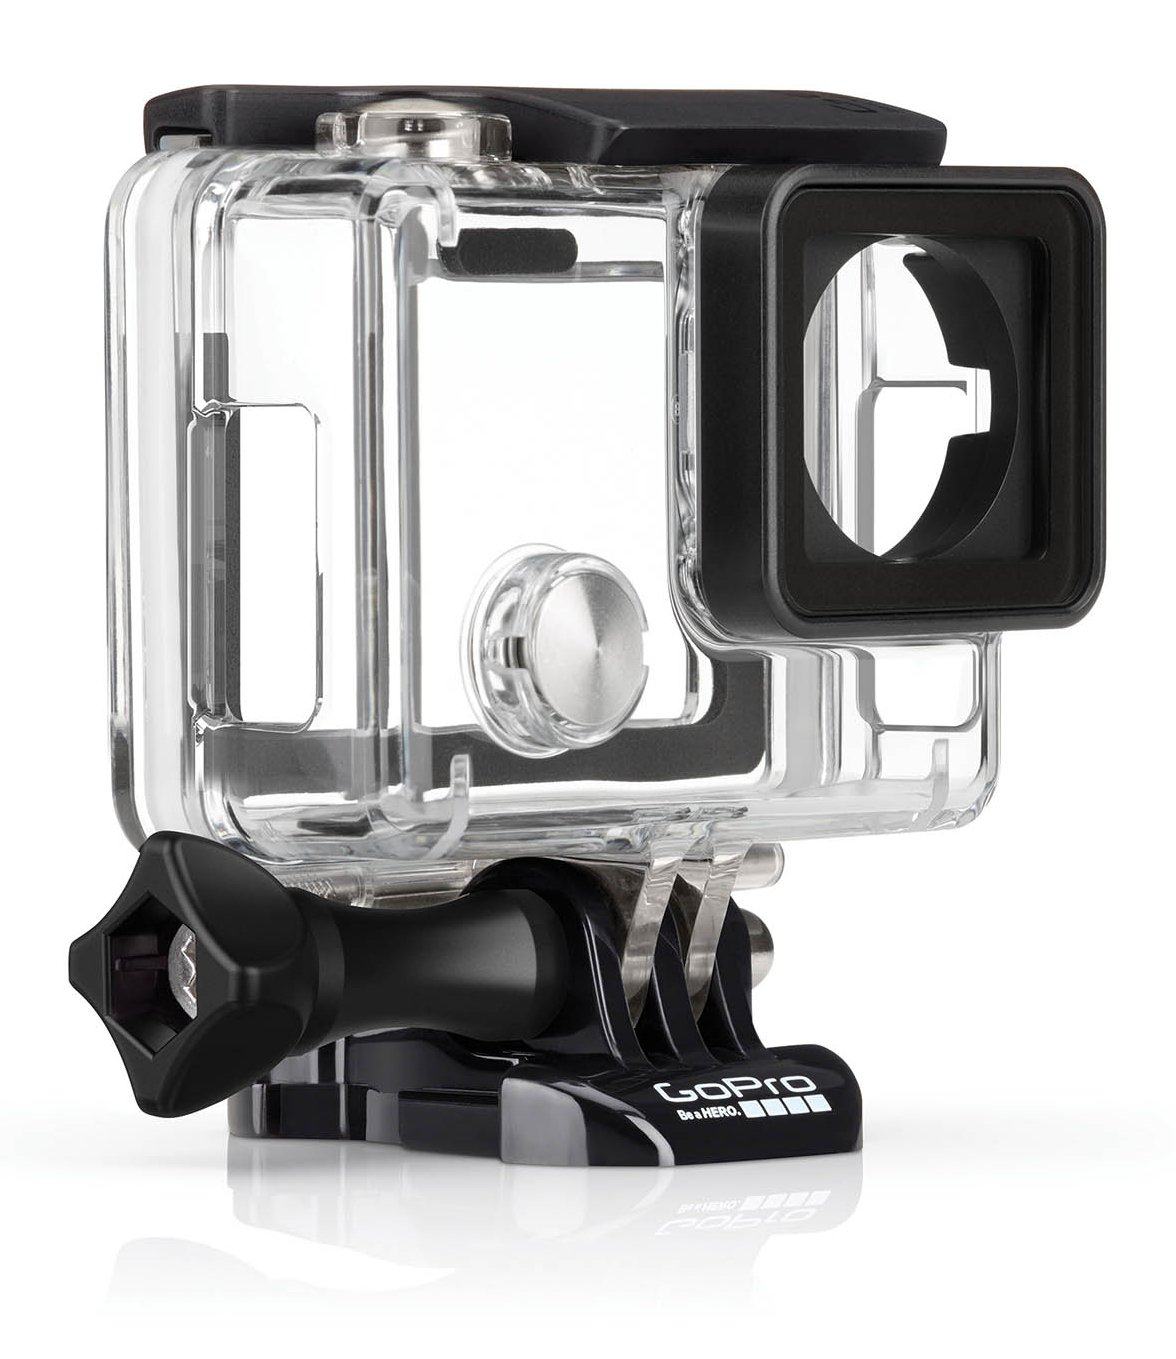 For GoPro Cameras